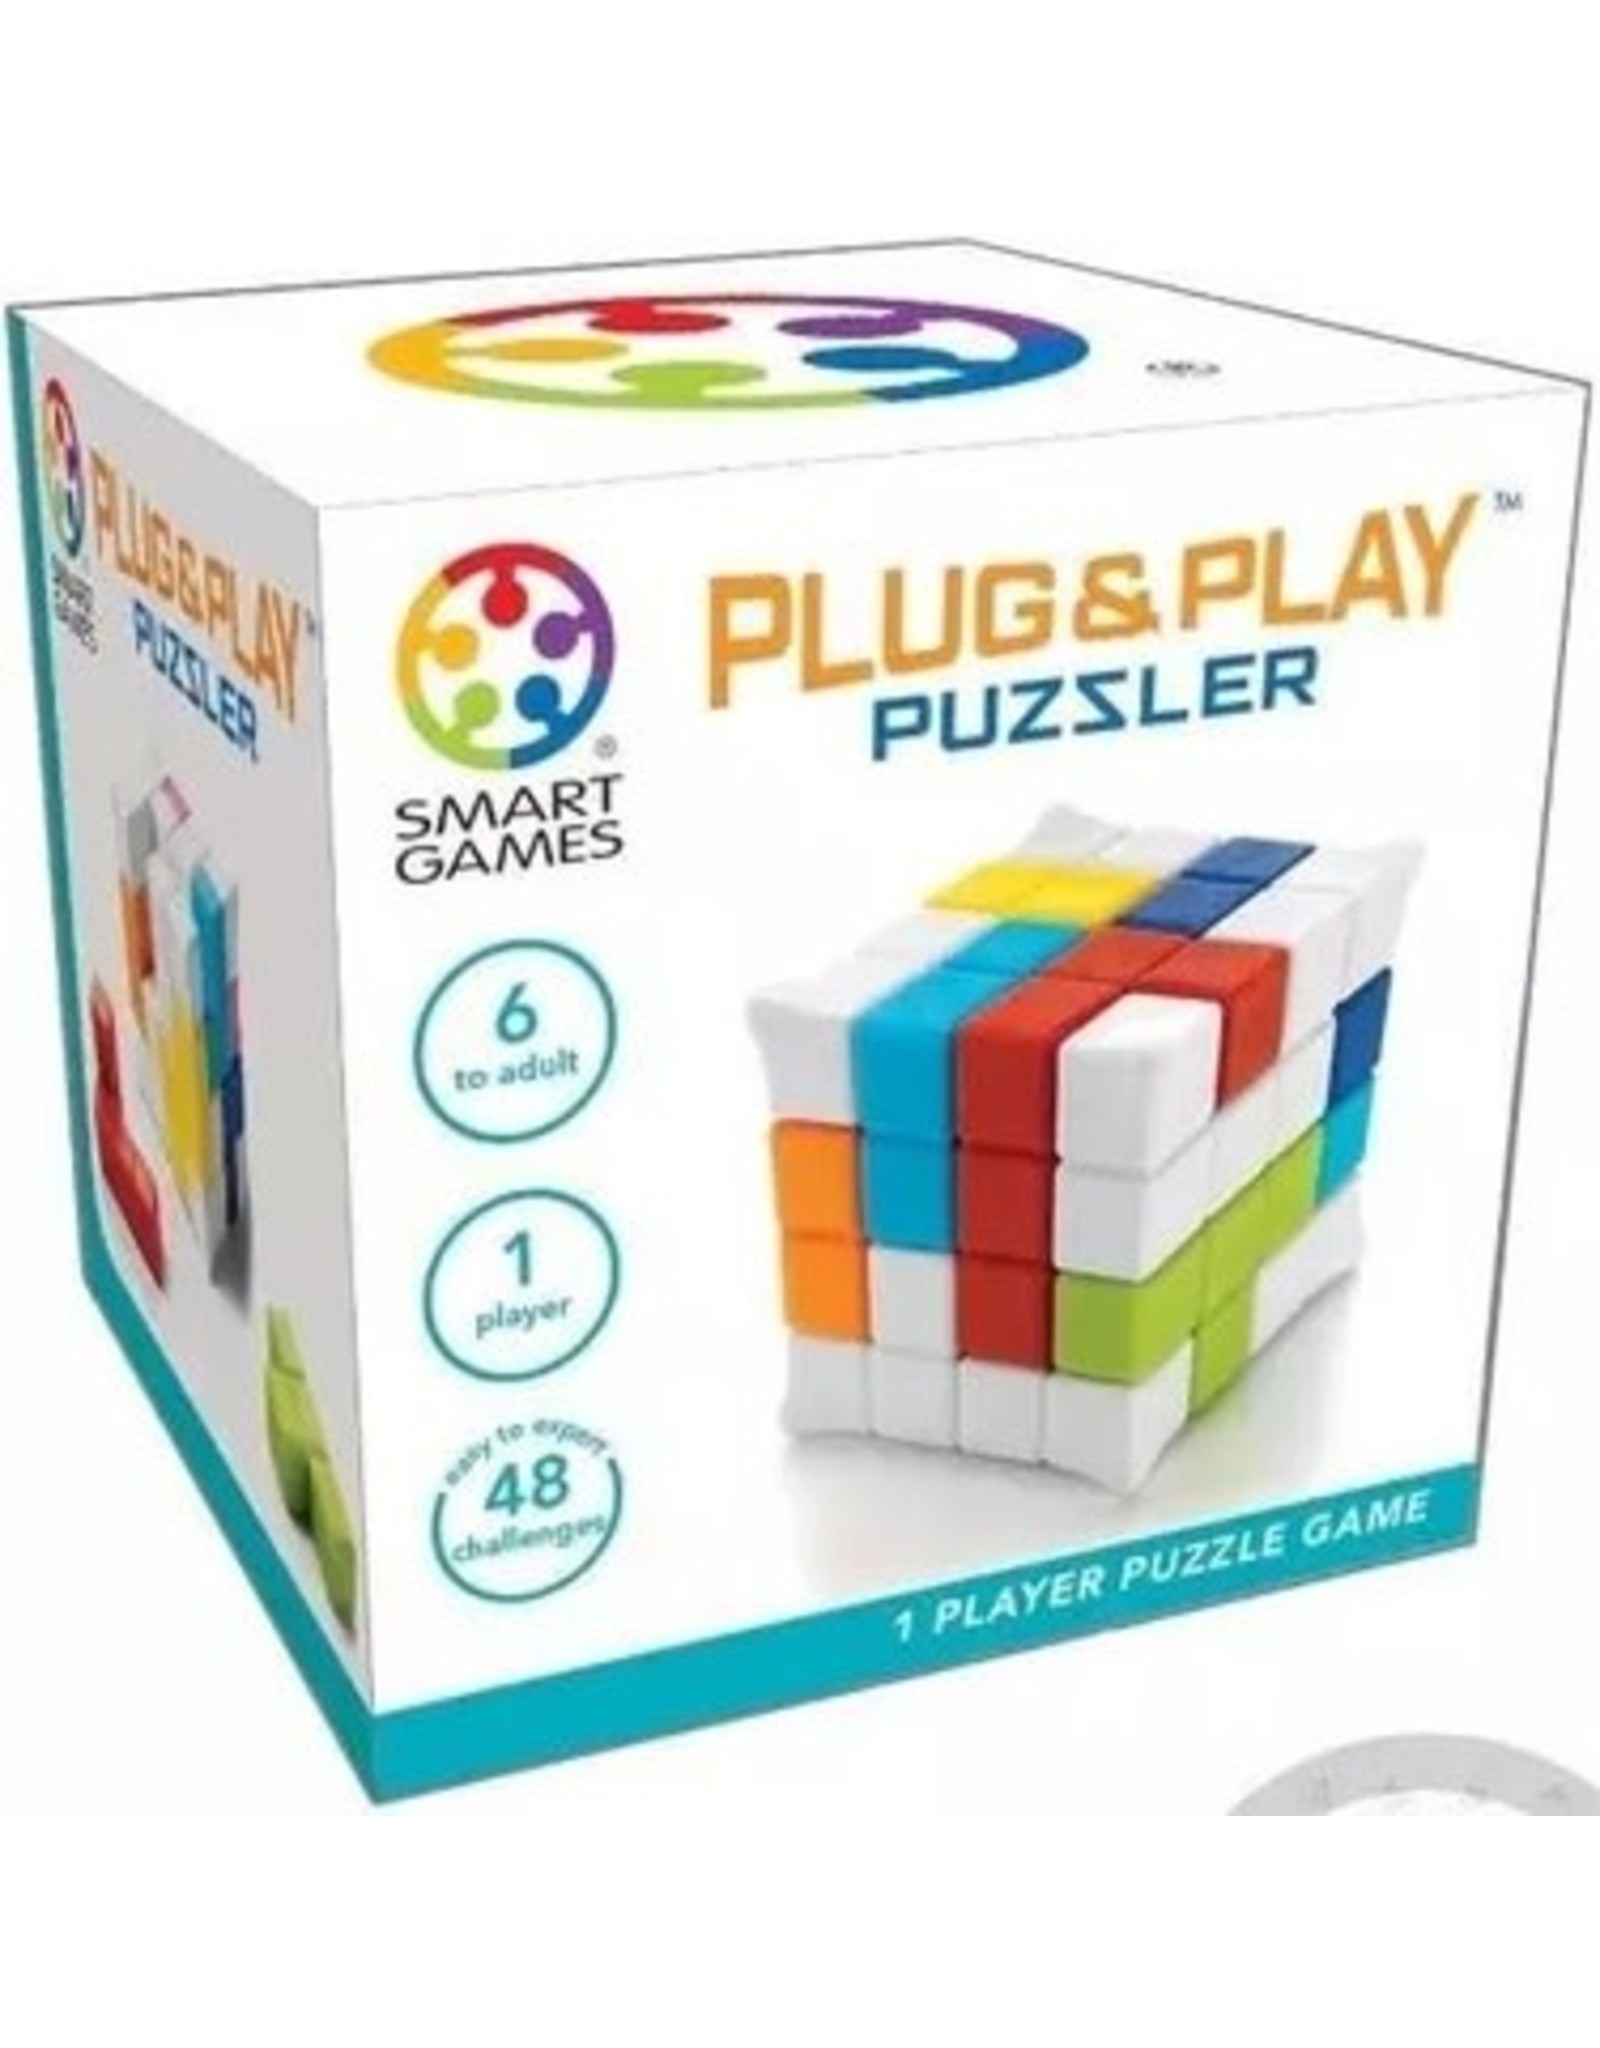 Smart Smart Games Puzzler Plug & Play